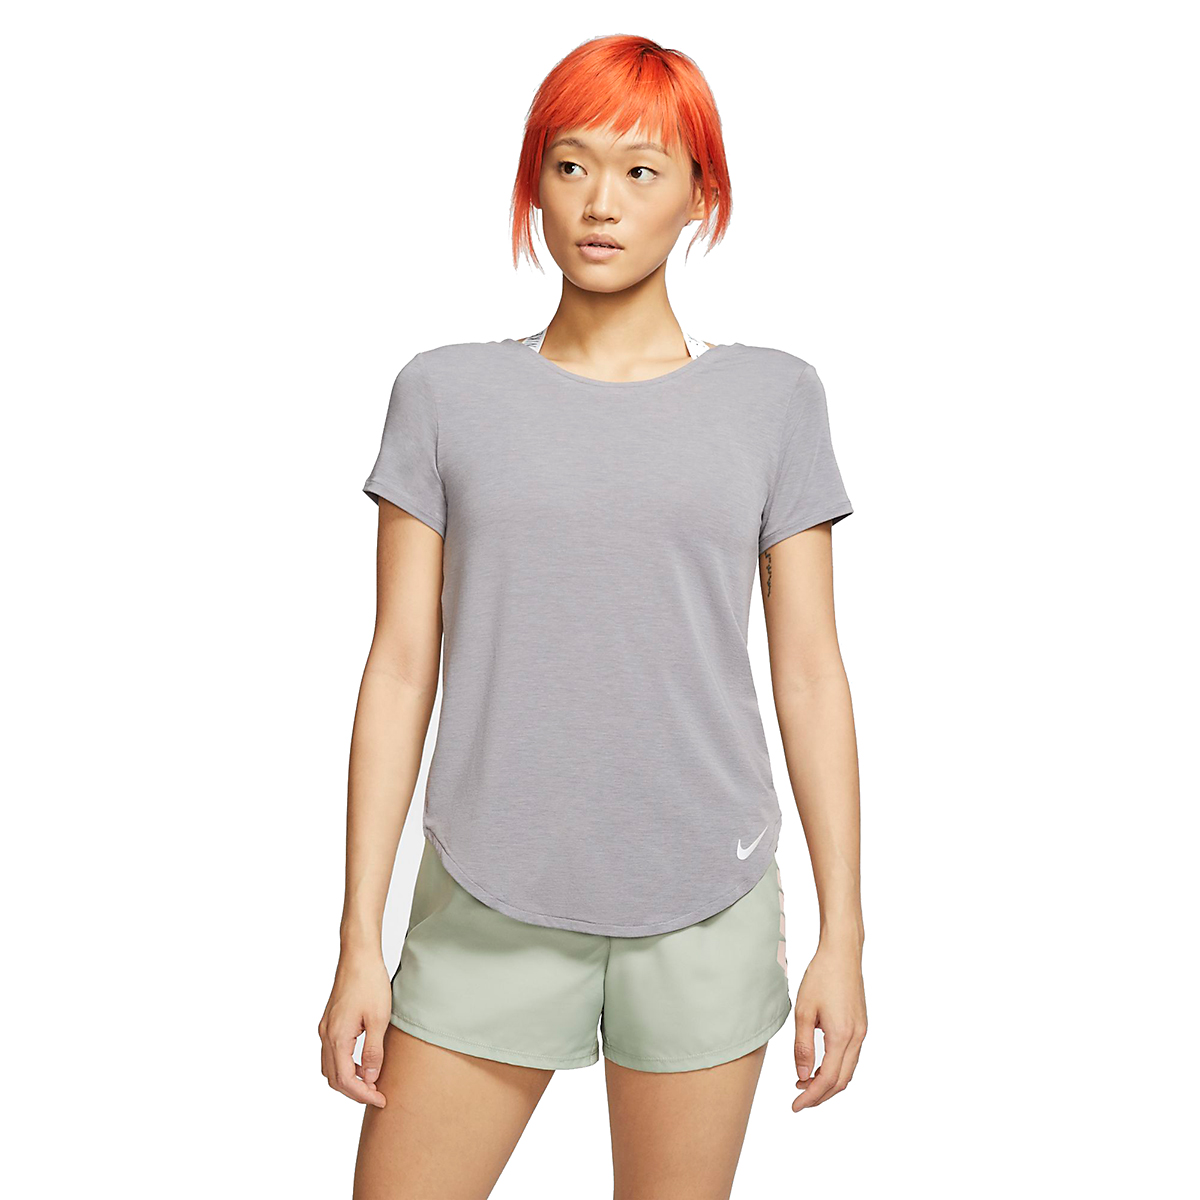 Women's Nike Twist Top Short Sleeve   - Color: Gunsmoke/Heather - Size: XL, Gunsmoke/Heather, large, image 1